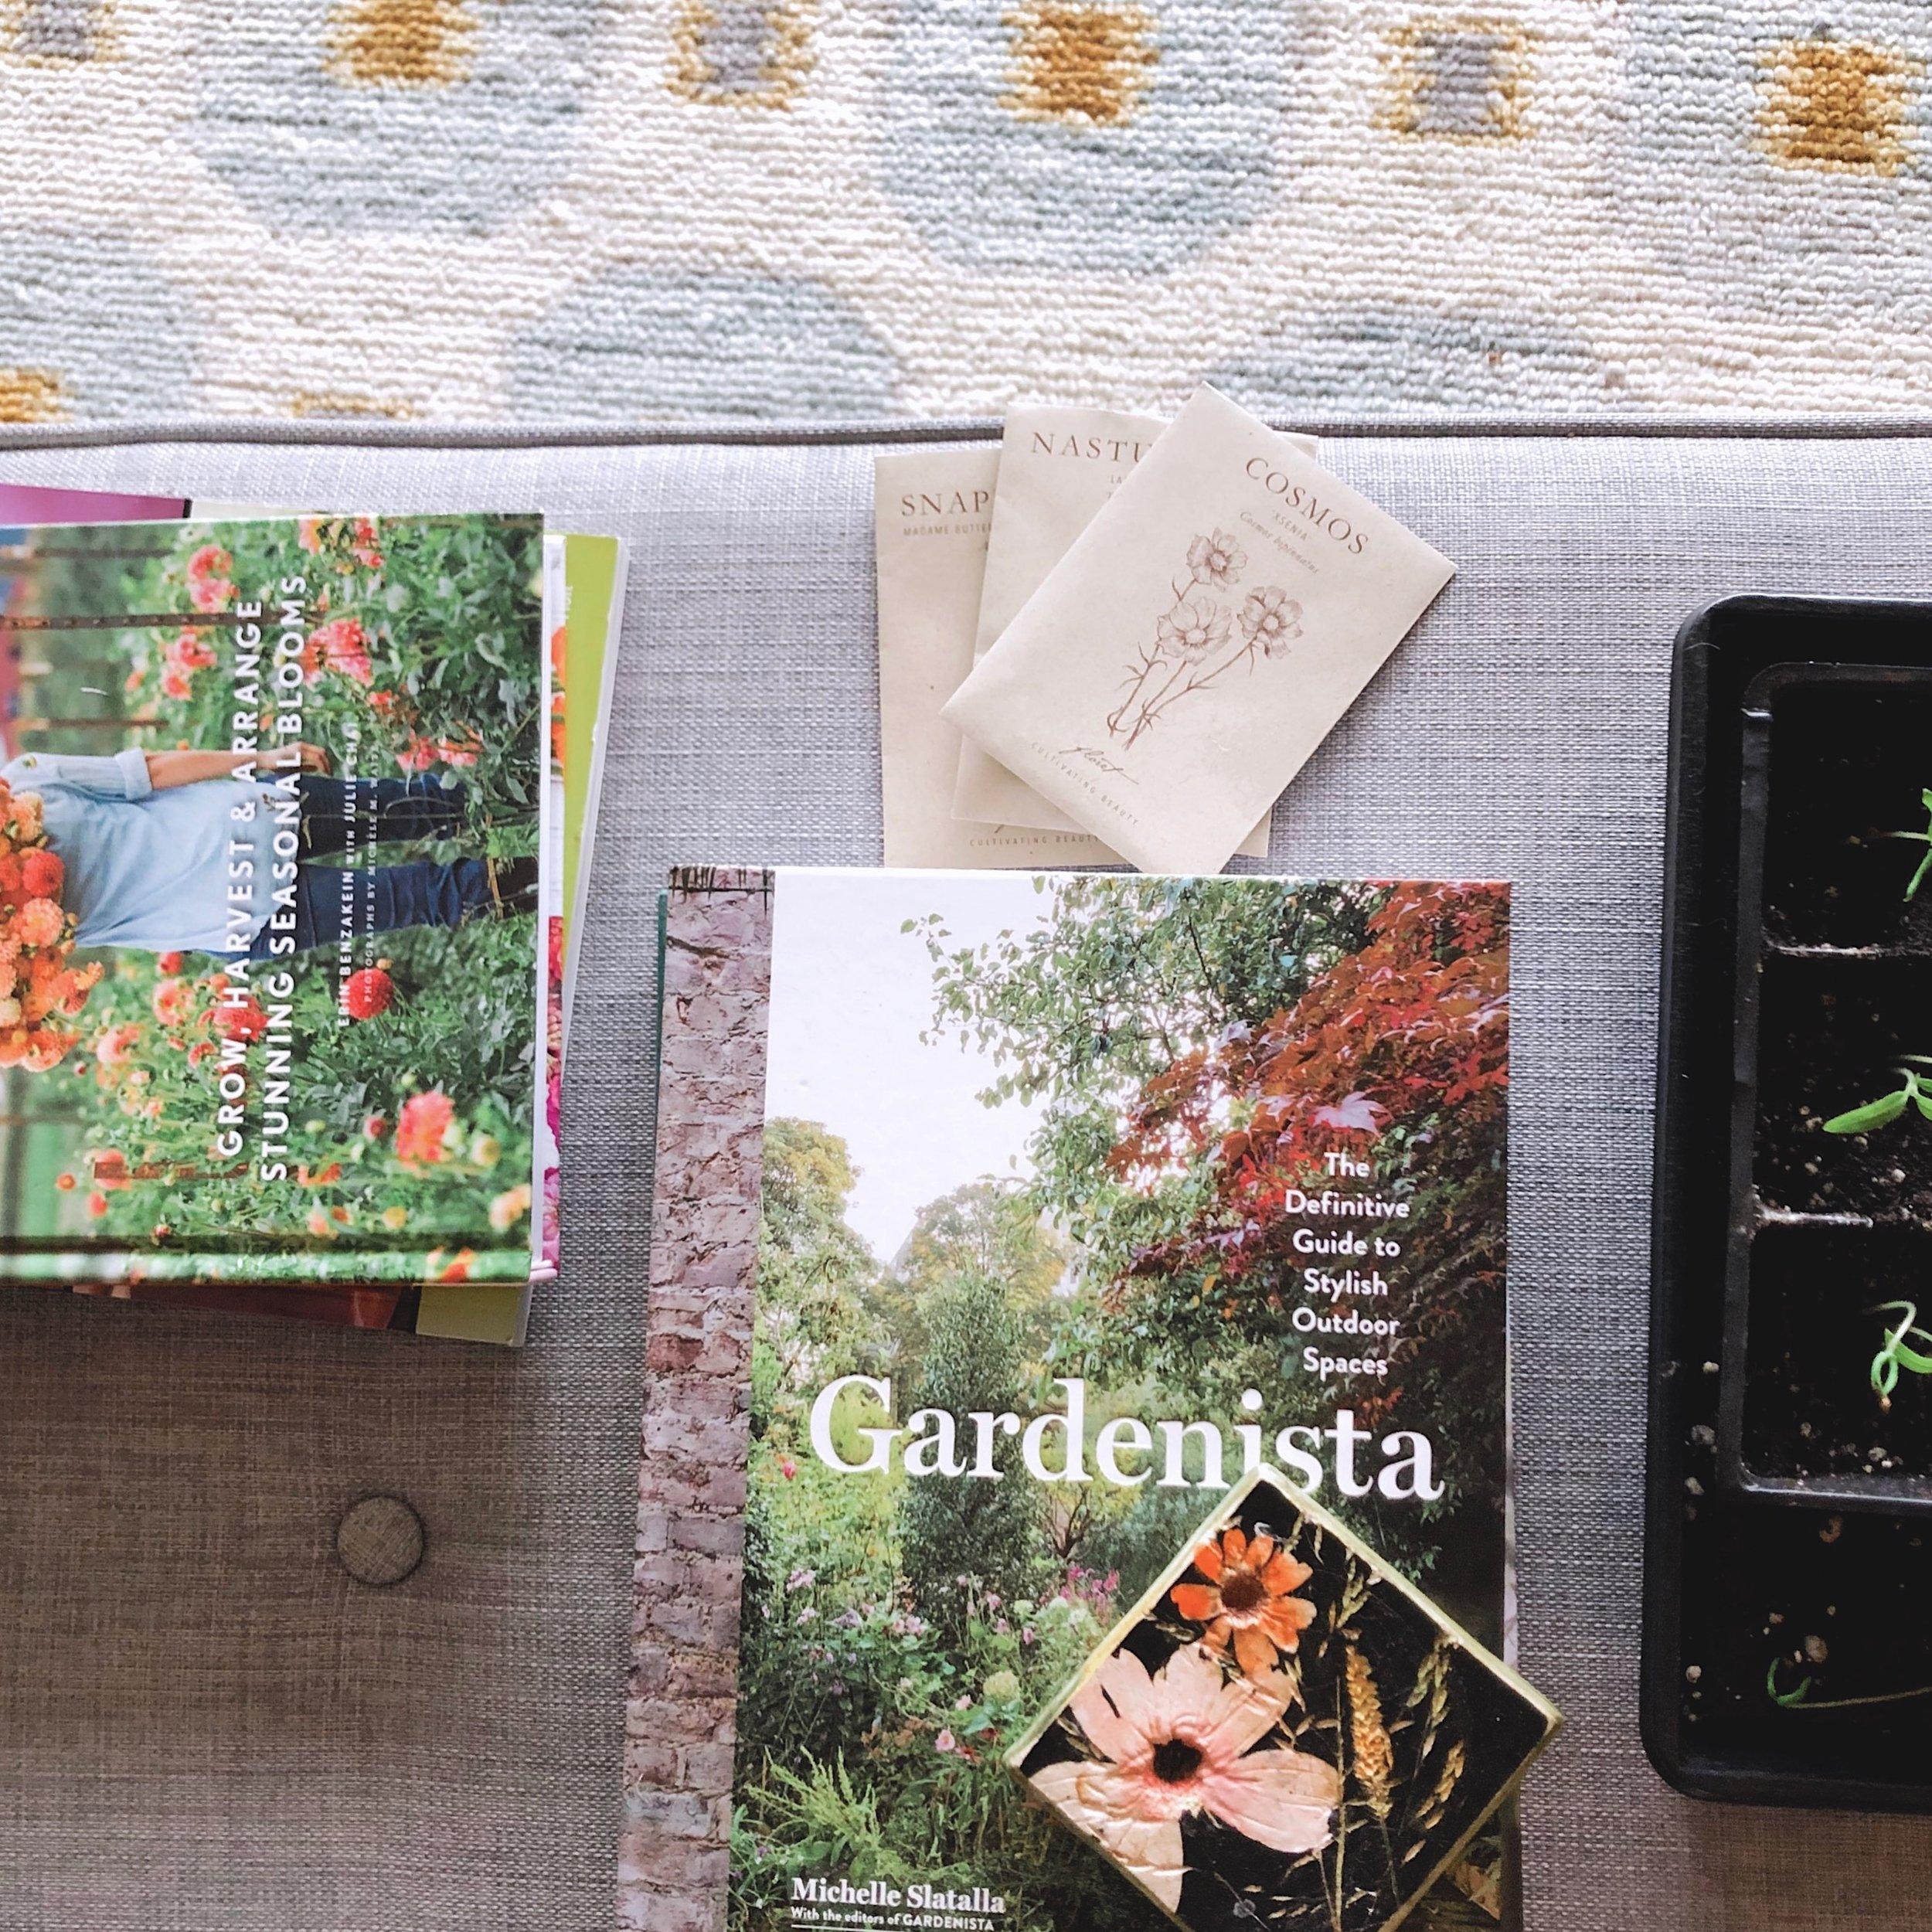 Favorite Garden Books of Winter 2019